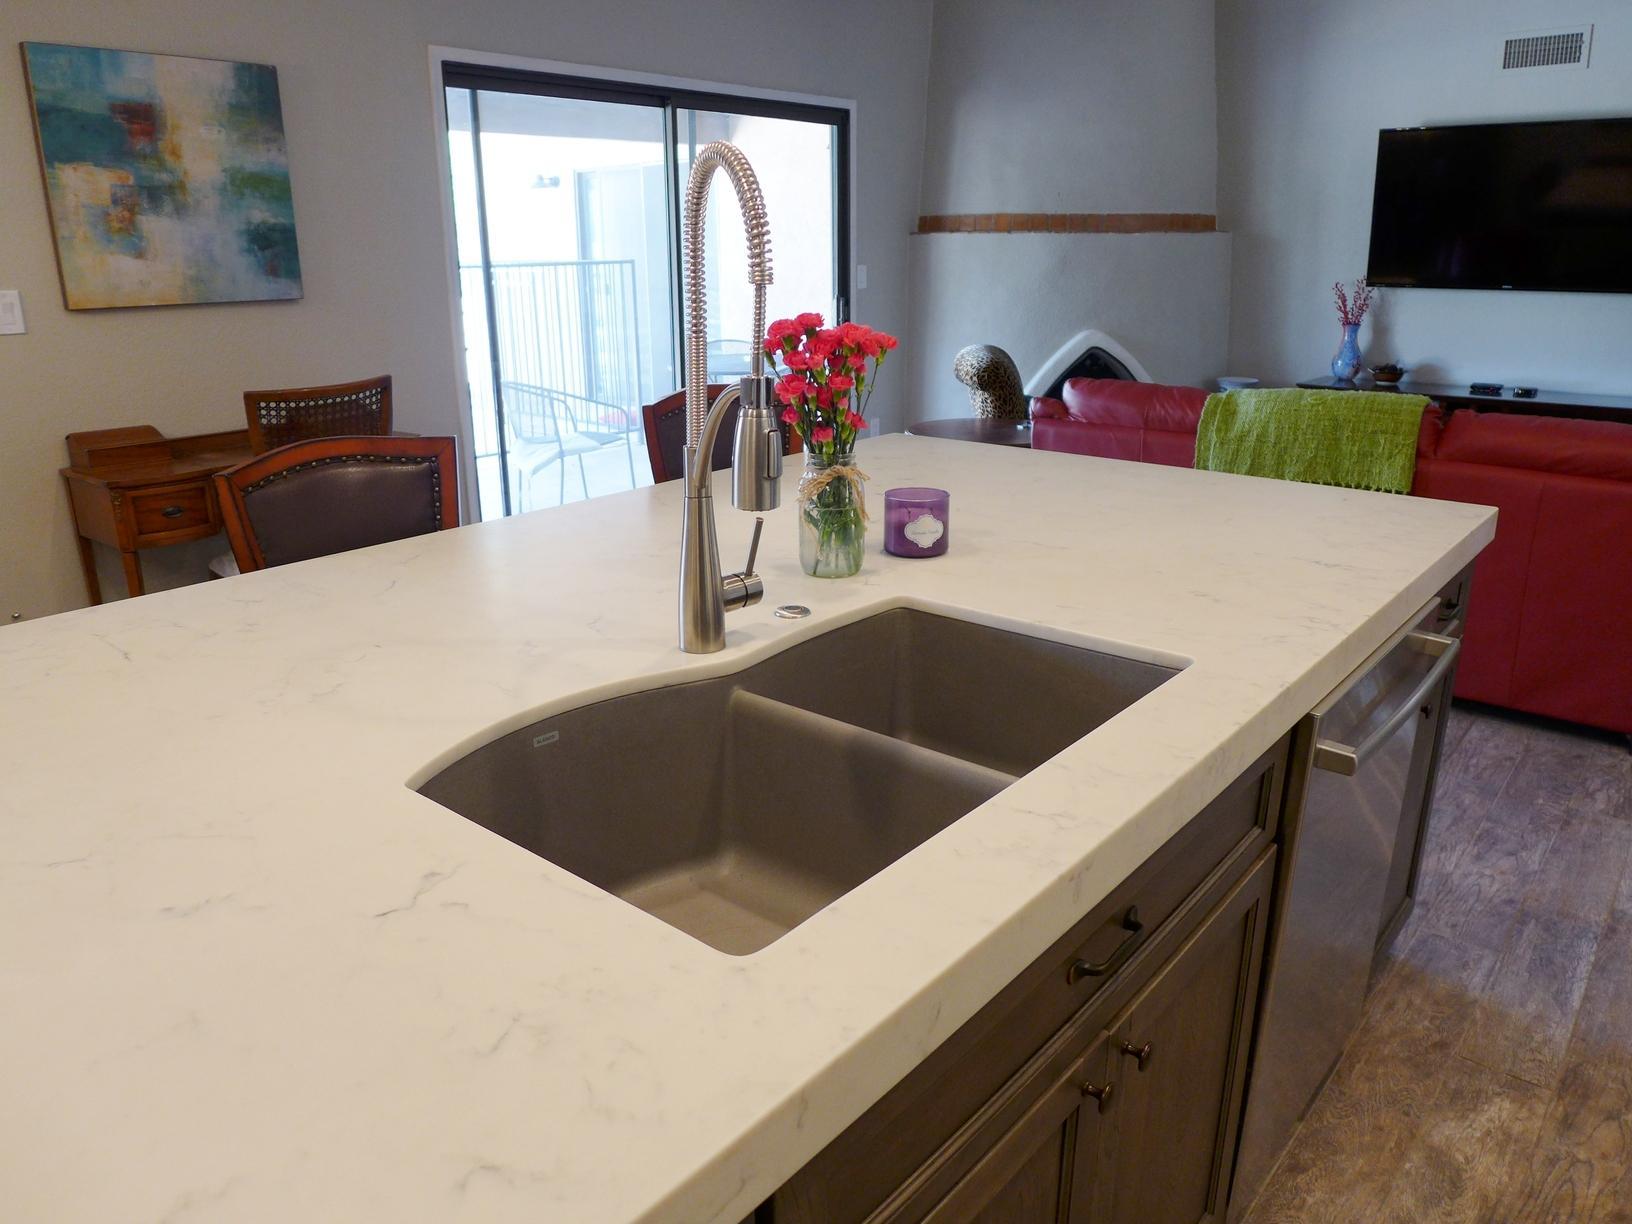 Remodeling   Kitchen Remodeling in Scottsdale, AZ   Island Sink